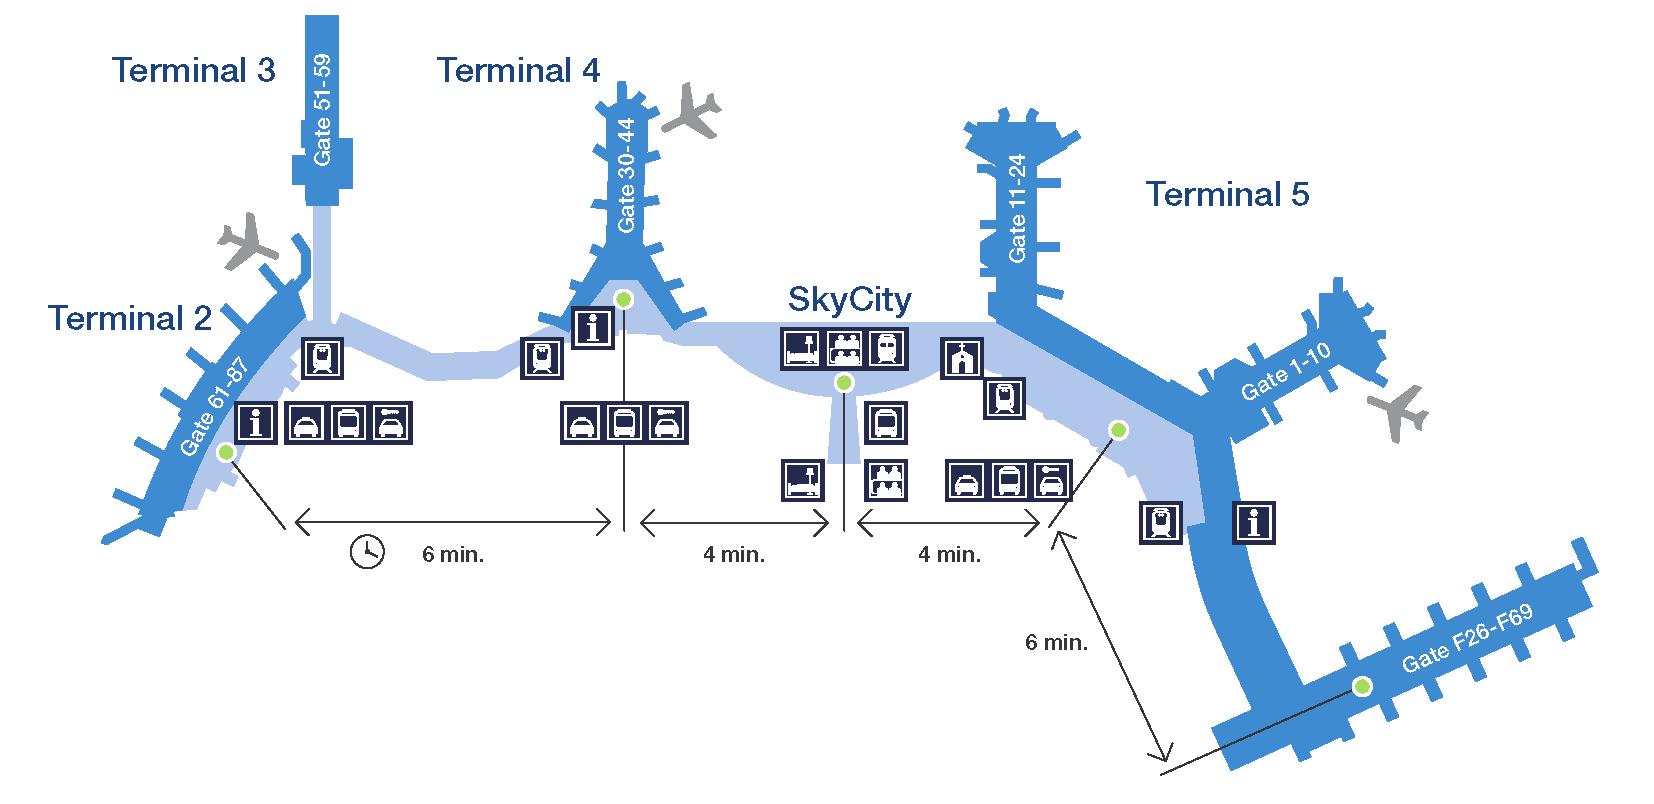 karta-alla-terminaler-arlanda